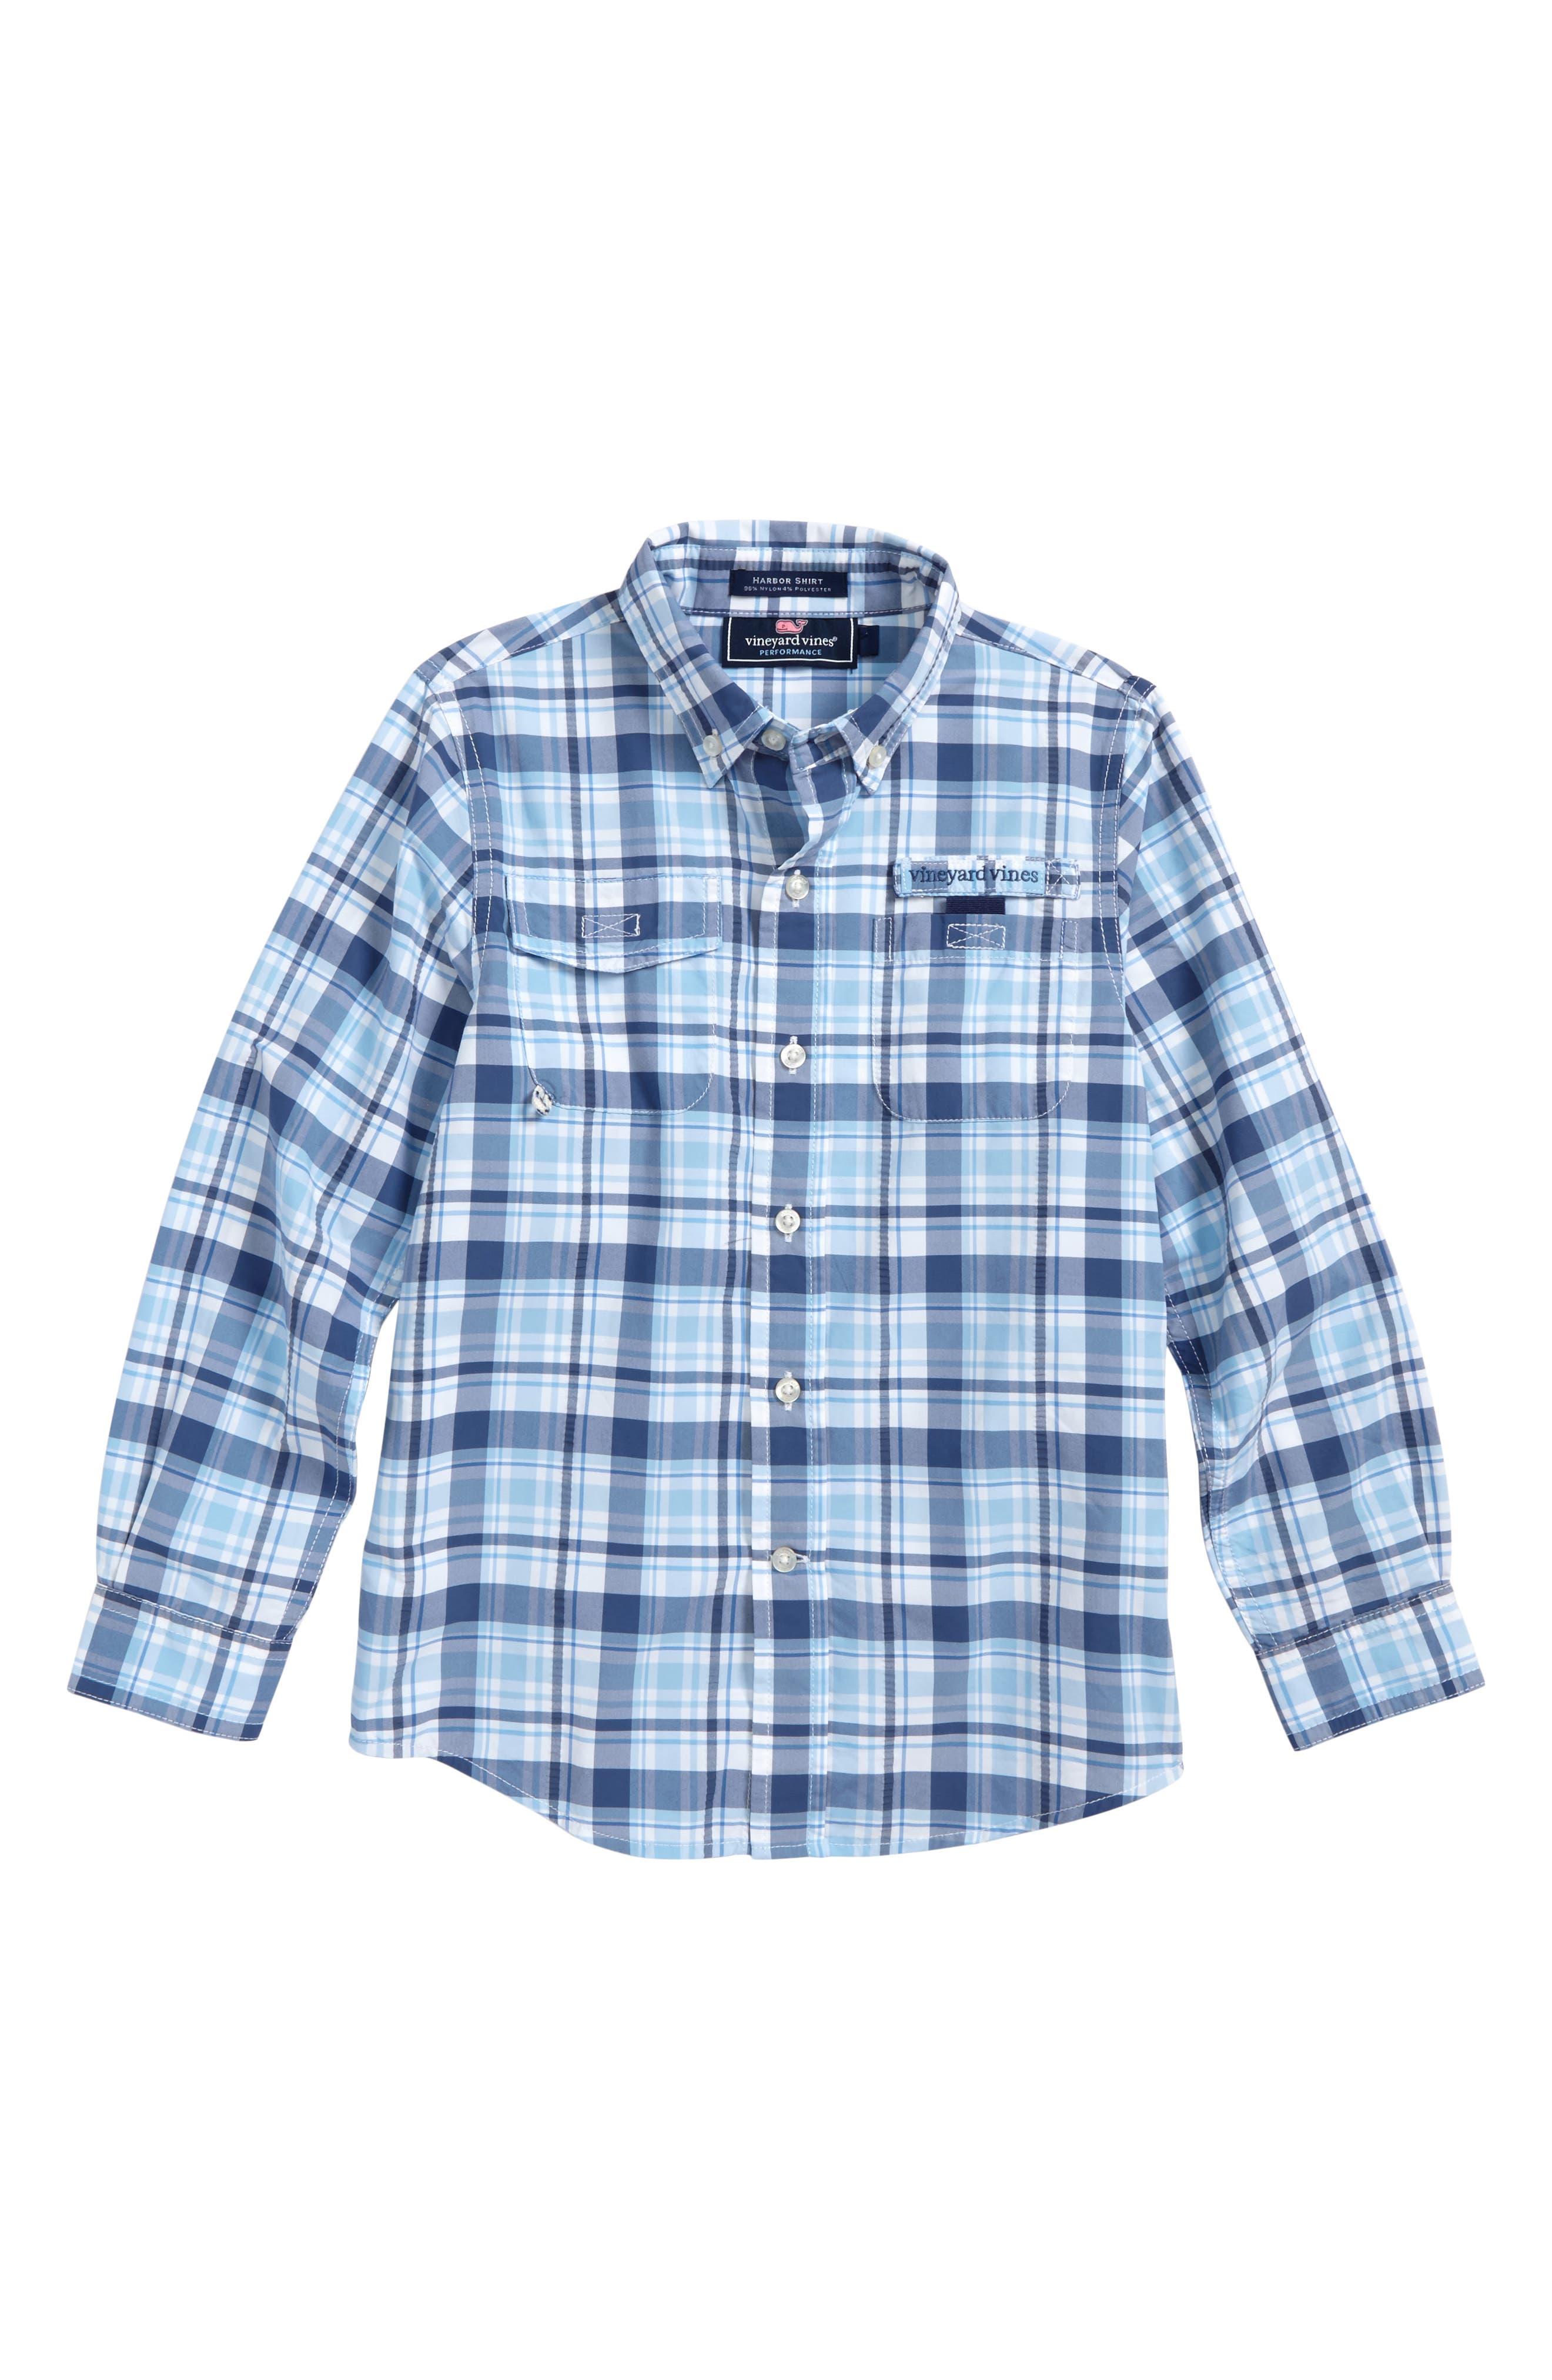 Harbor Plaid Shirt,                         Main,                         color, 463